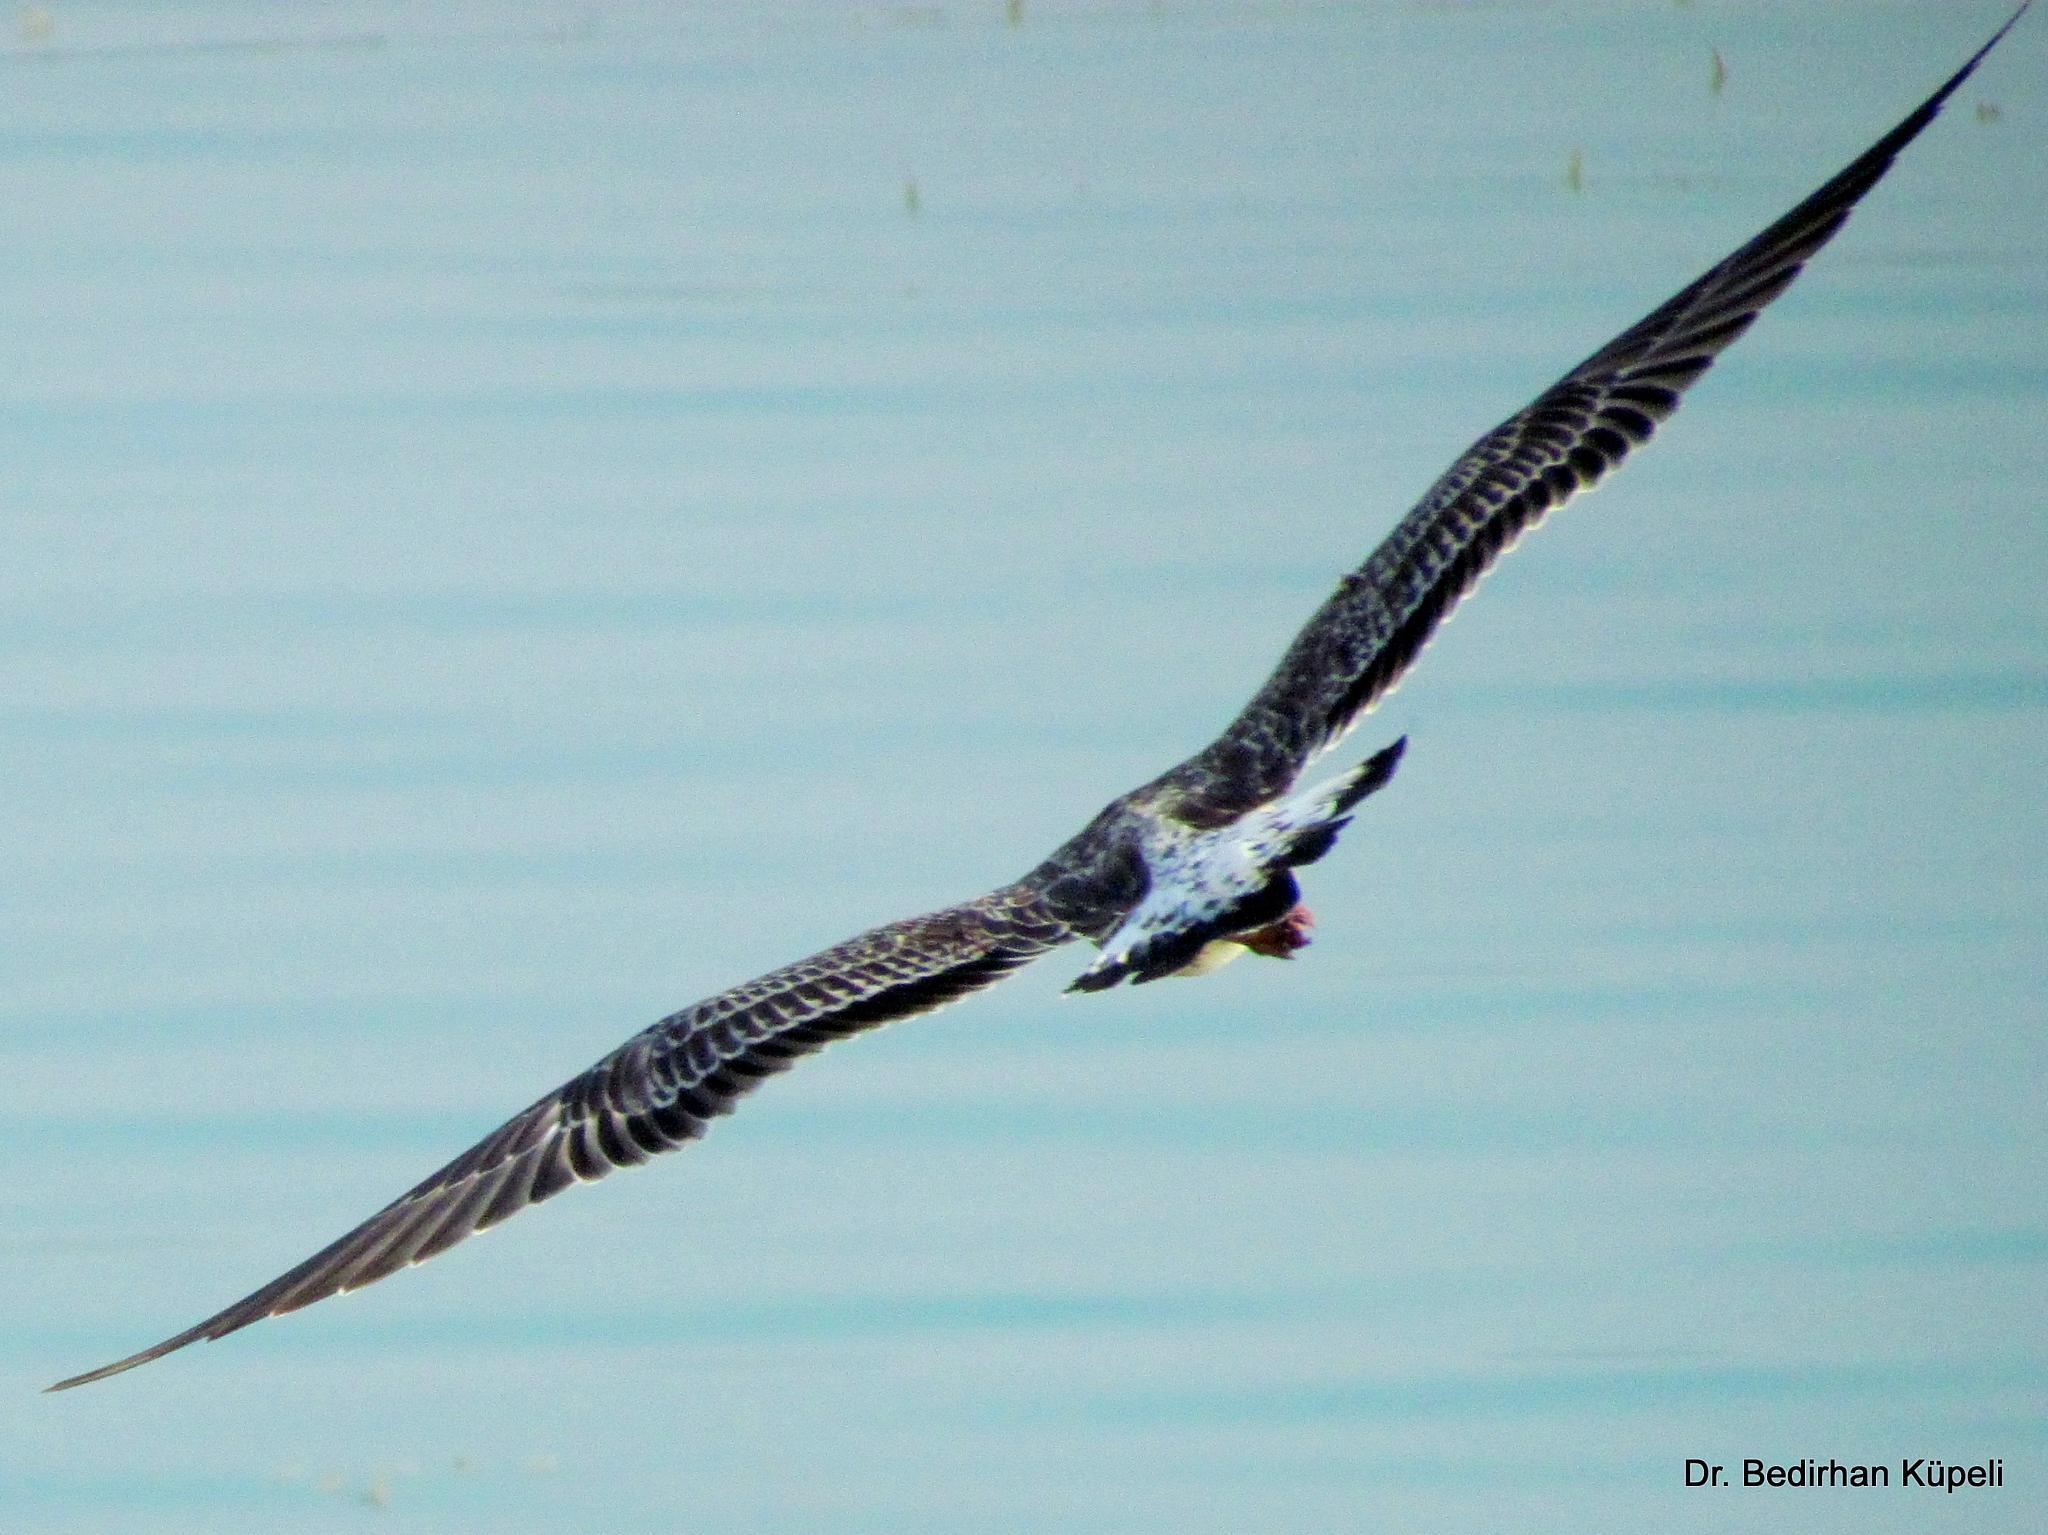 Giant Gull by Bedirhan Küpeli